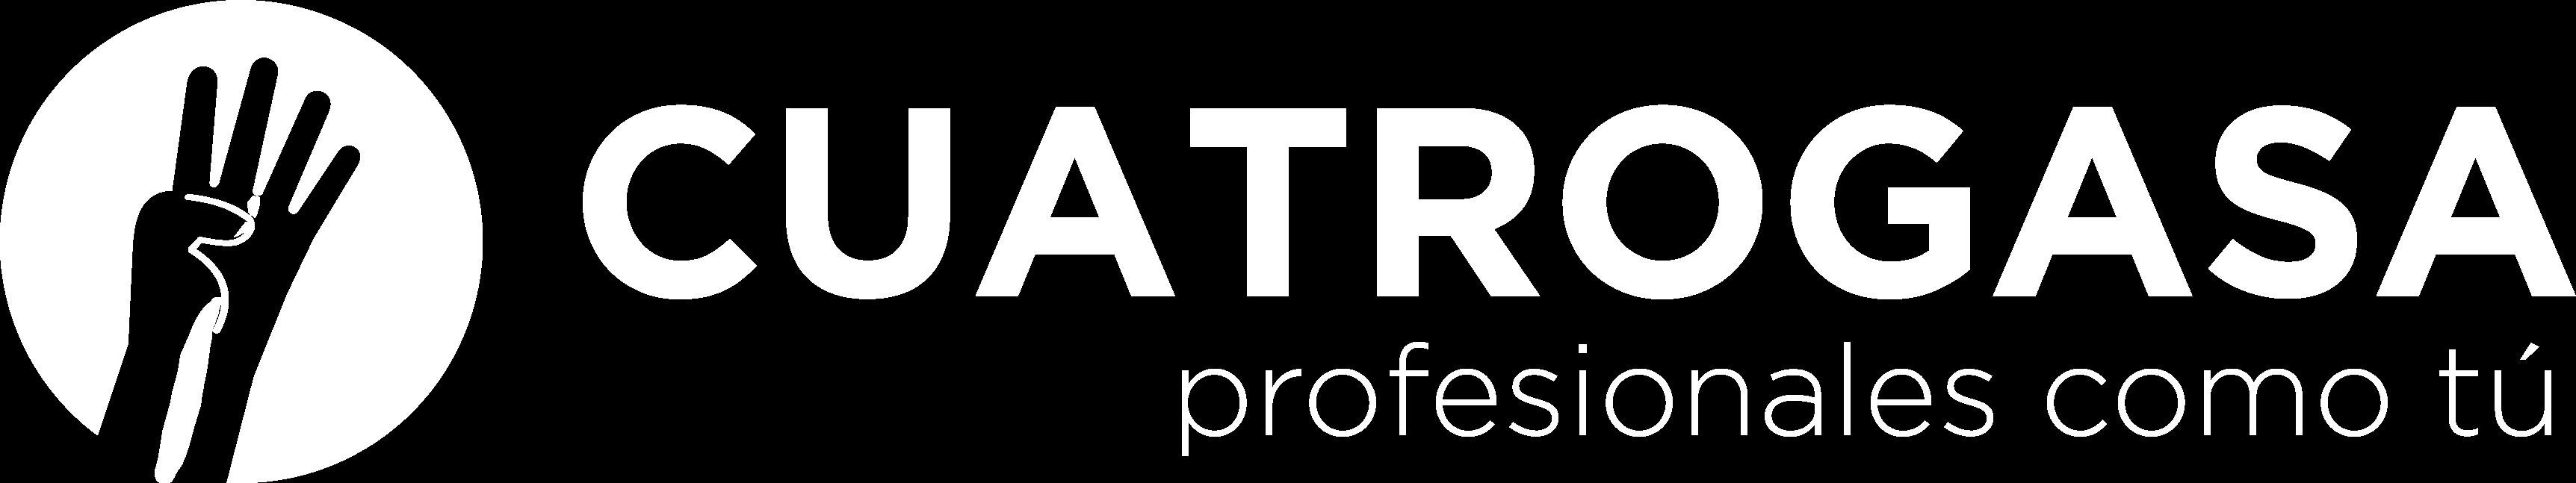 Cuatrogasa Profesional